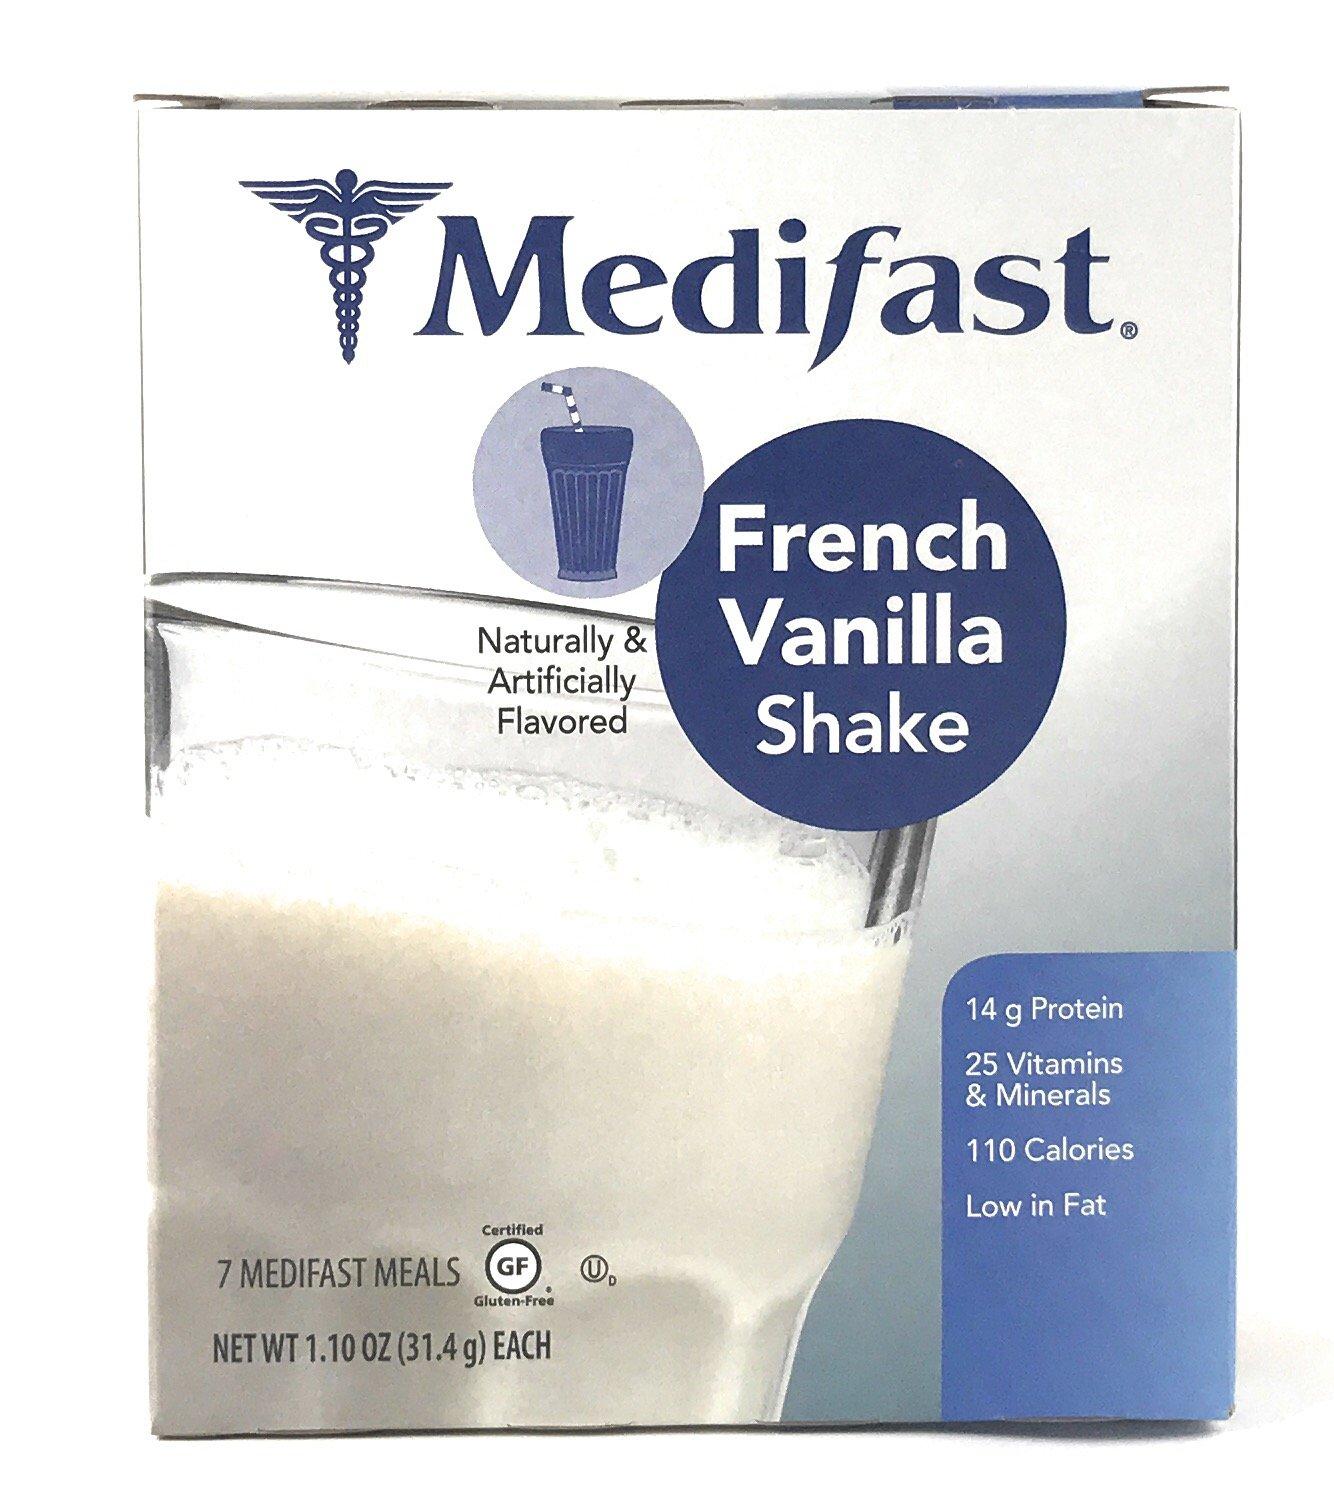 Medifast French Vanilla Shake (1 Box/7 Servings)